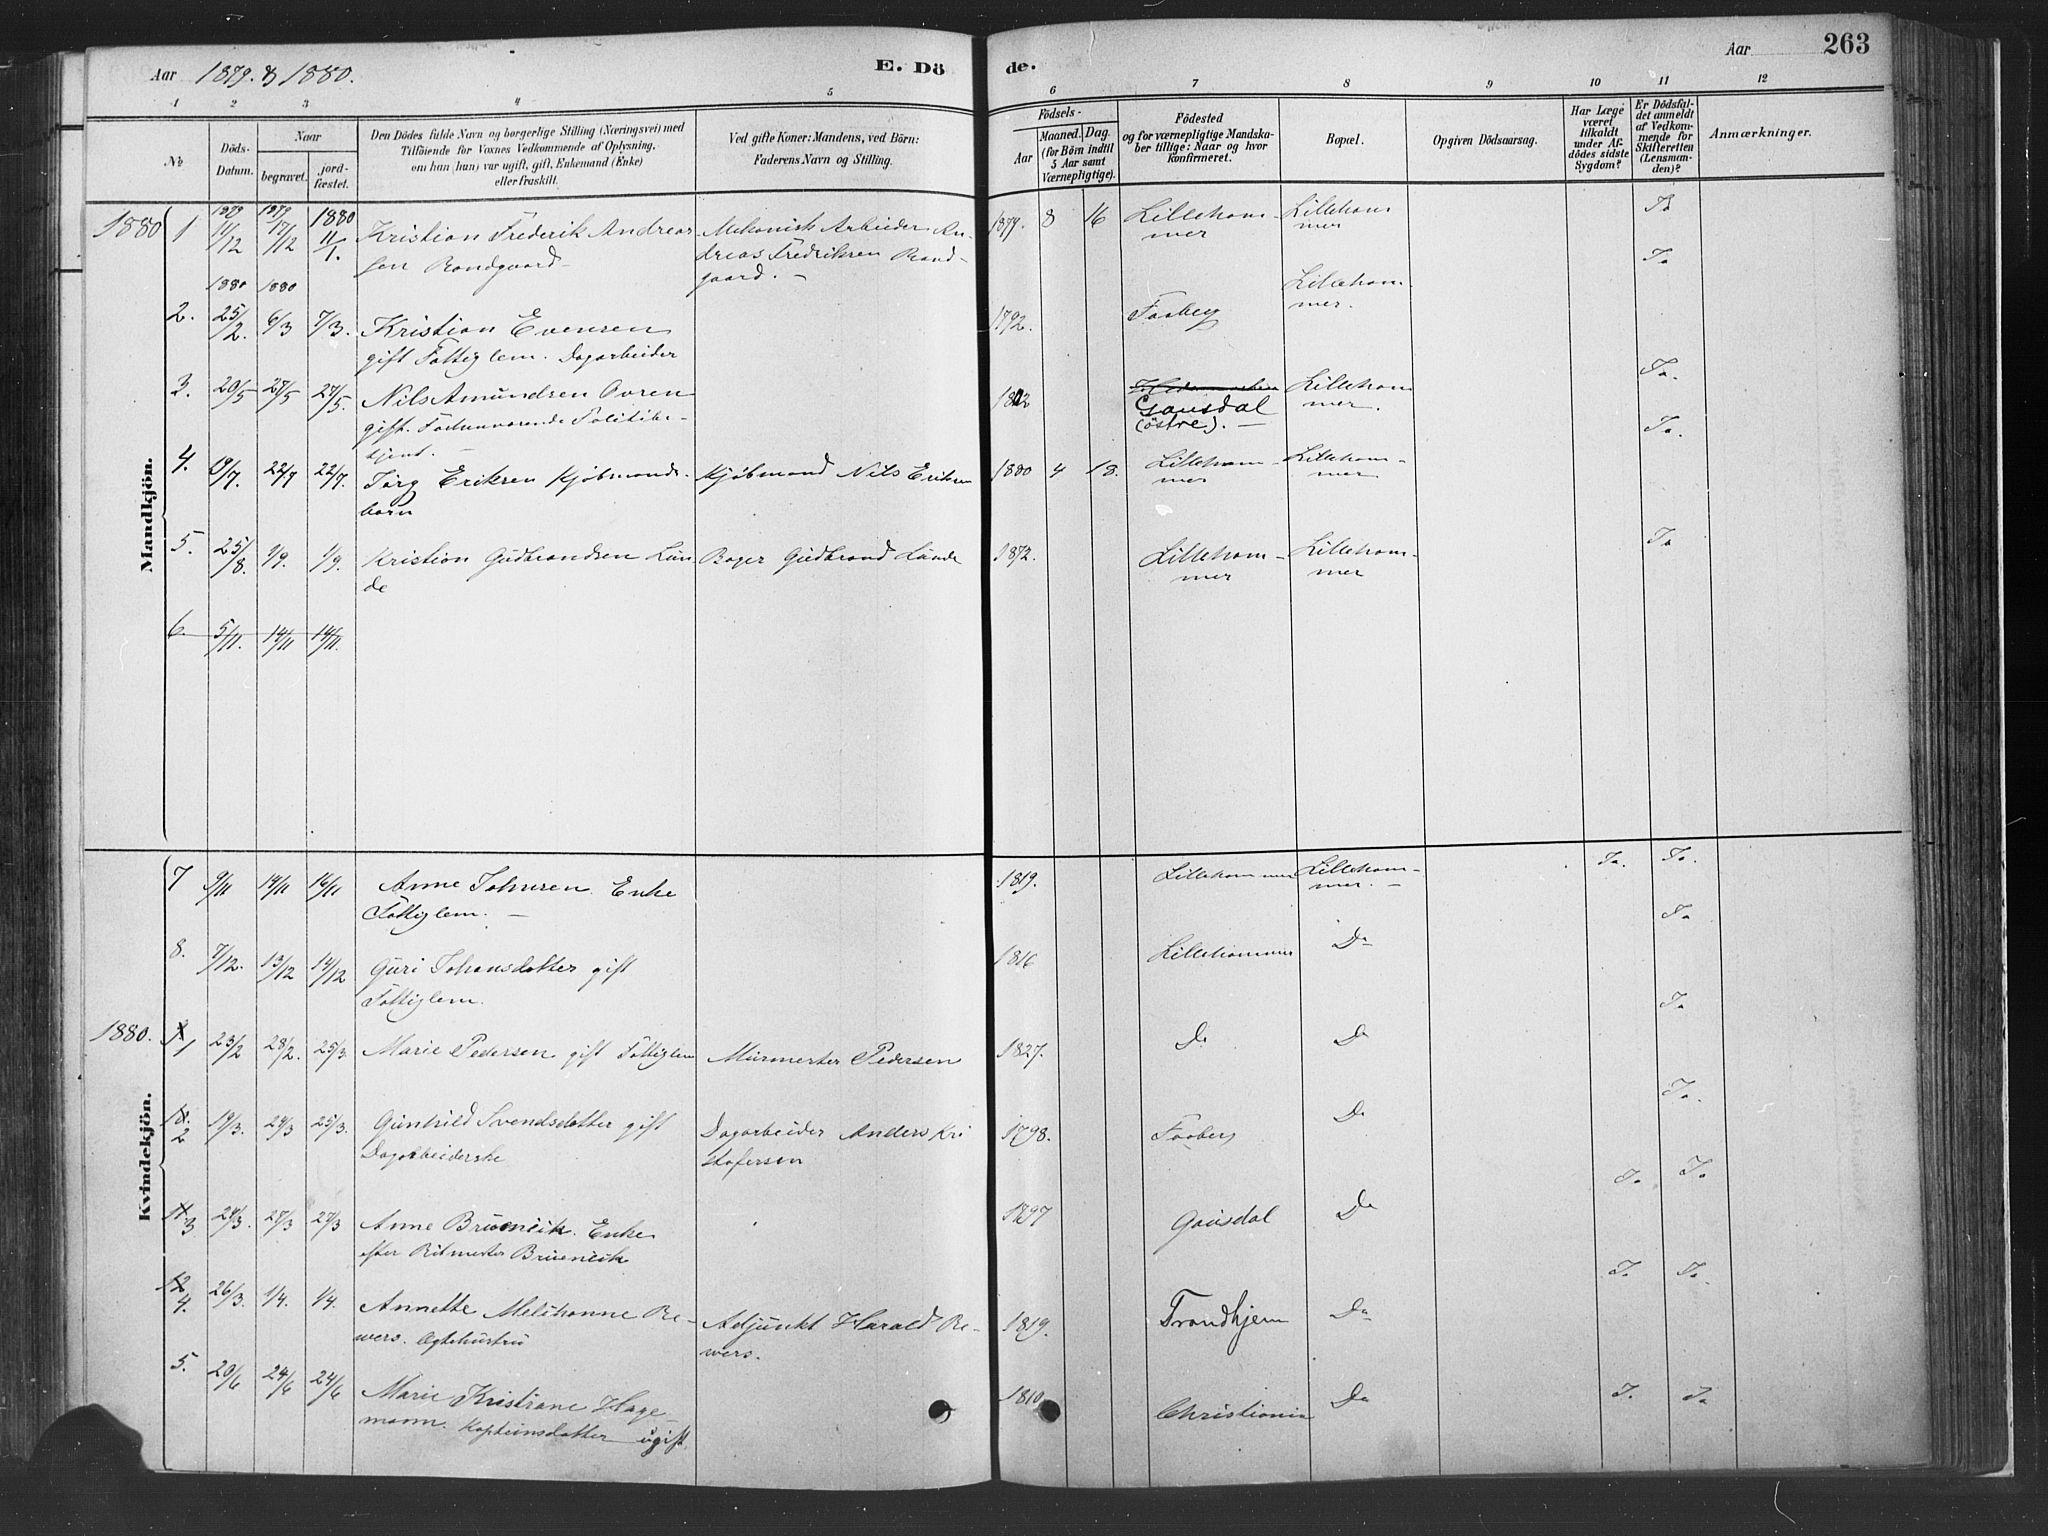 SAH, Fåberg prestekontor, H/Ha/Haa/L0010: Parish register (official) no. 10, 1879-1900, p. 263